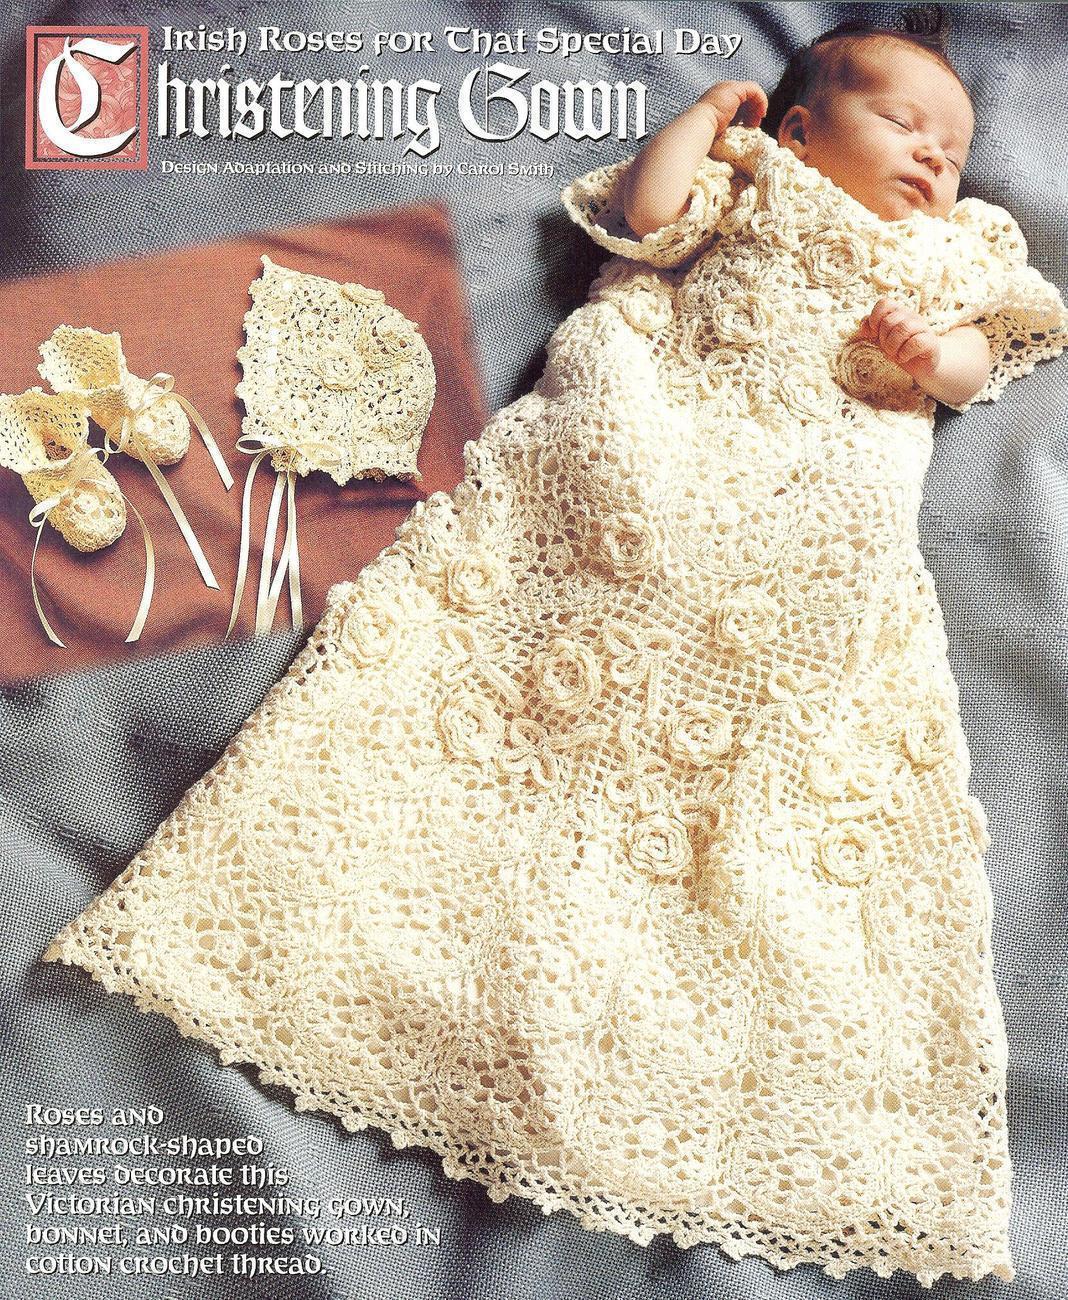 Free Crochet Pattern Baby Cradle Purse : CROCHETED CHRISTENING GOWN PATTERNS CROCHET FREE PATTERNS